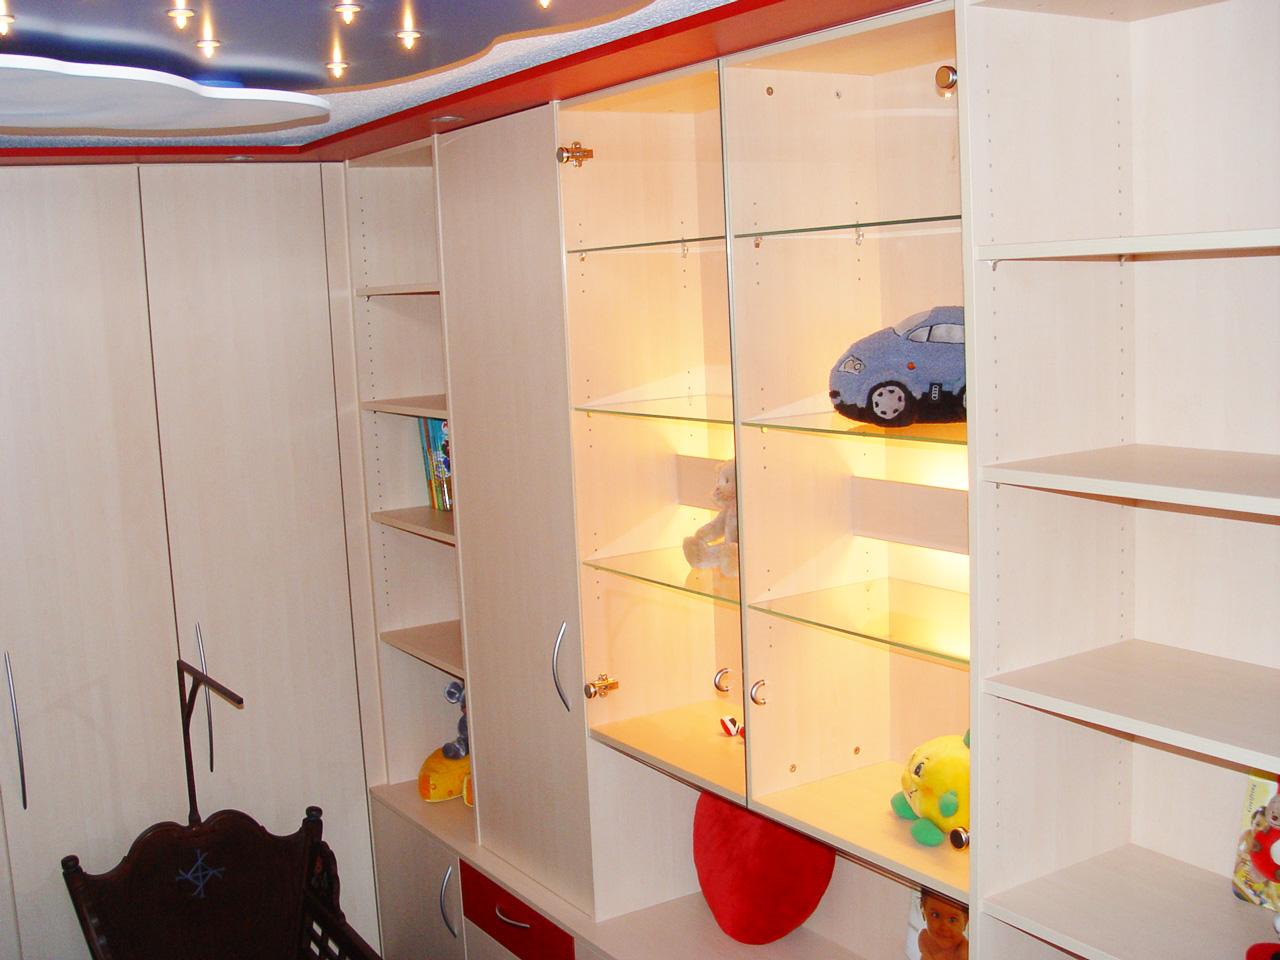 D11-Kinderzimmer-in-Dekor-Ahorn